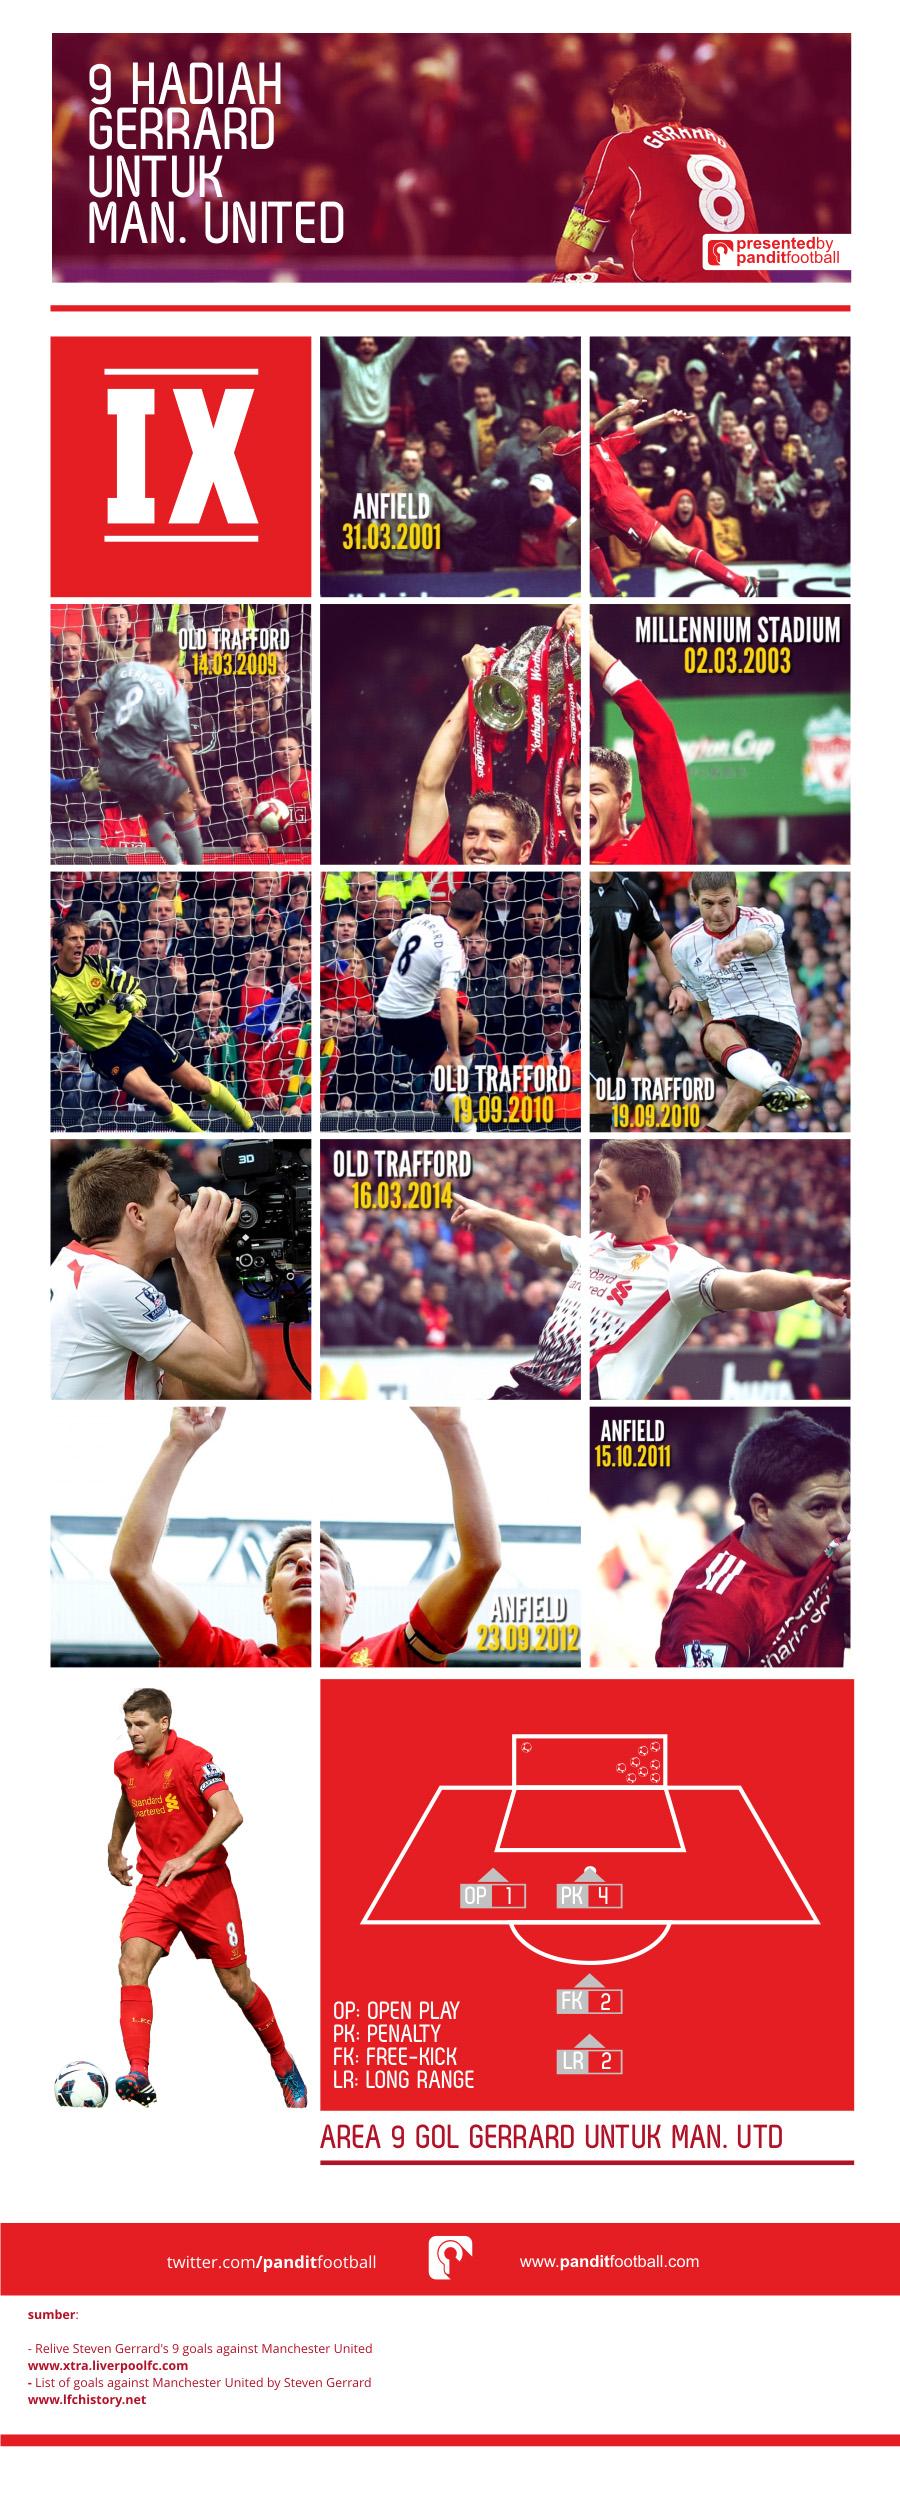 9 Hadiah Gerrard untuk Man. United (Klik Gambar untuk Memperbesar)